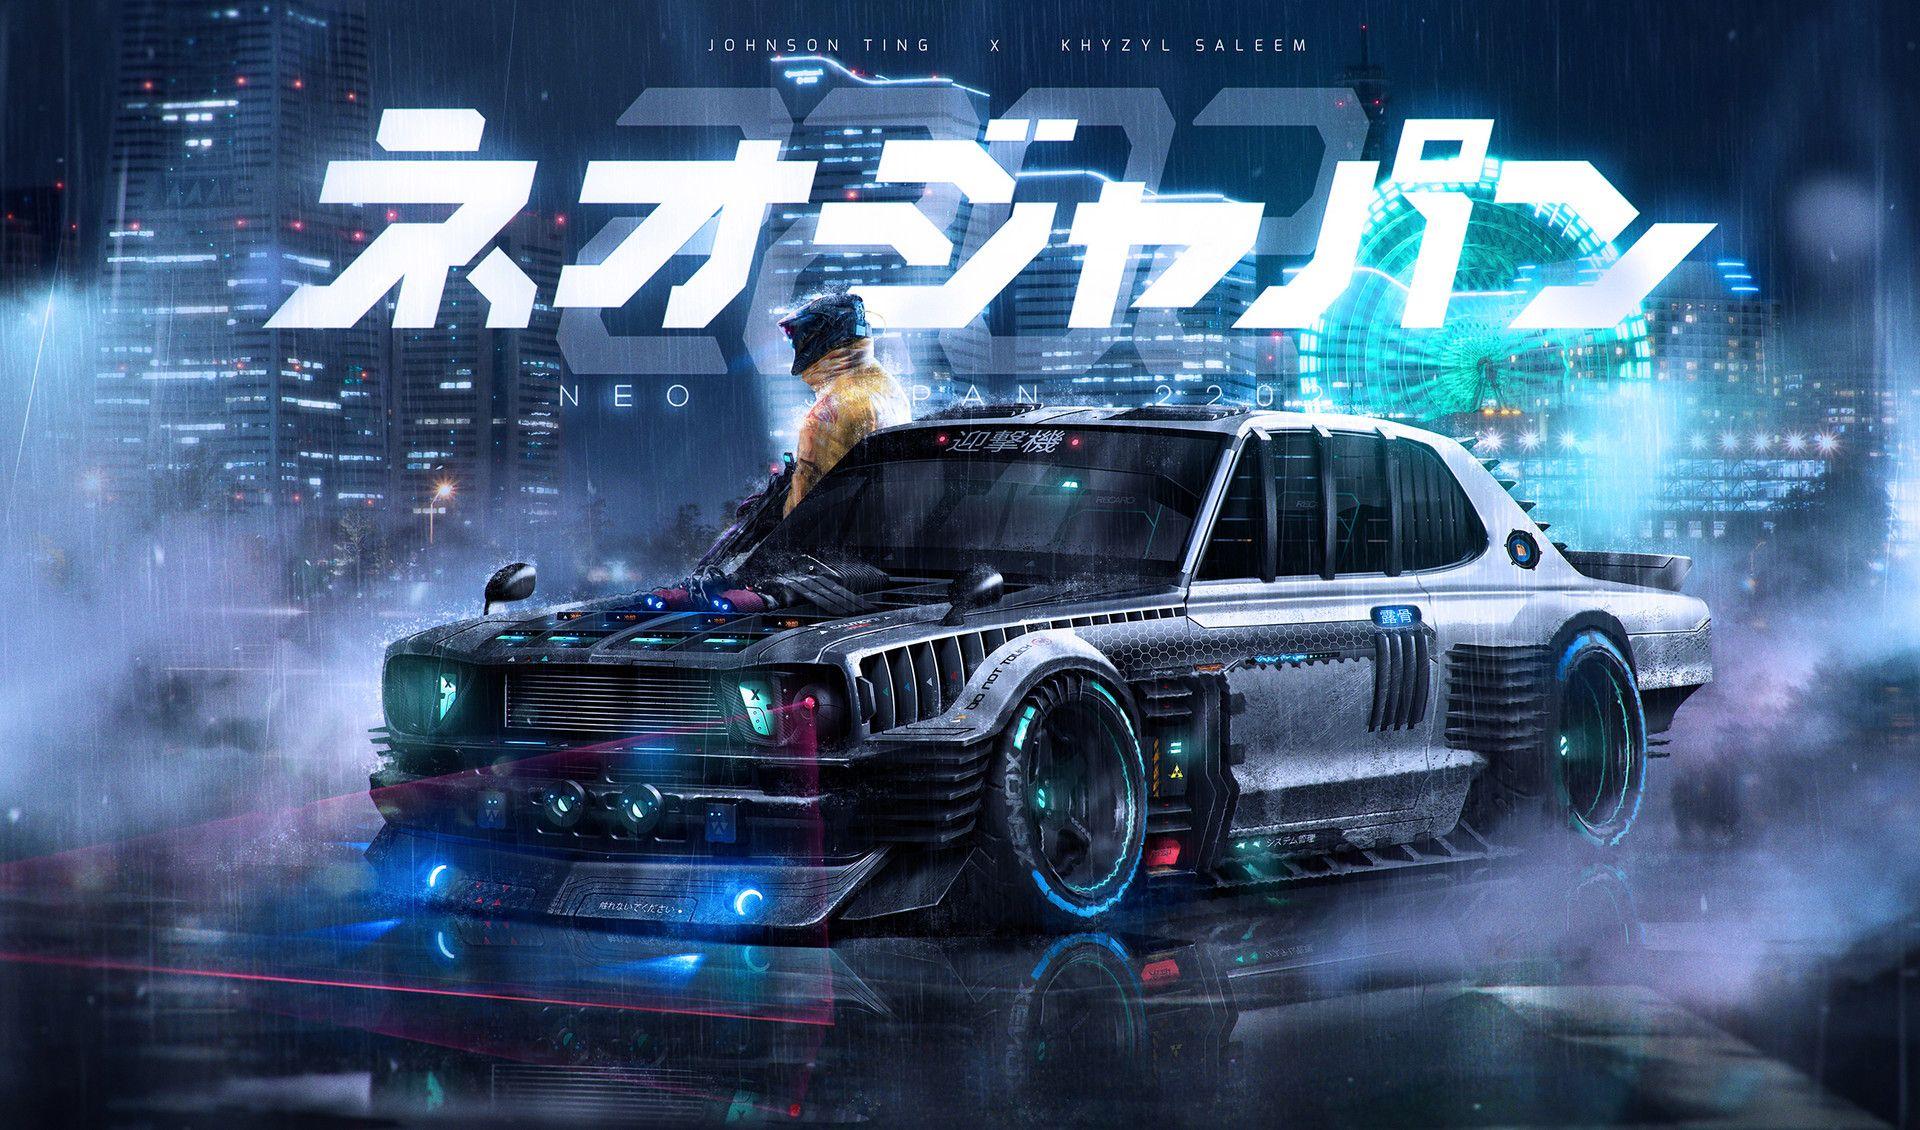 Pin by Анатолий on Johnson Ting | Futuristic cars, Neo ...